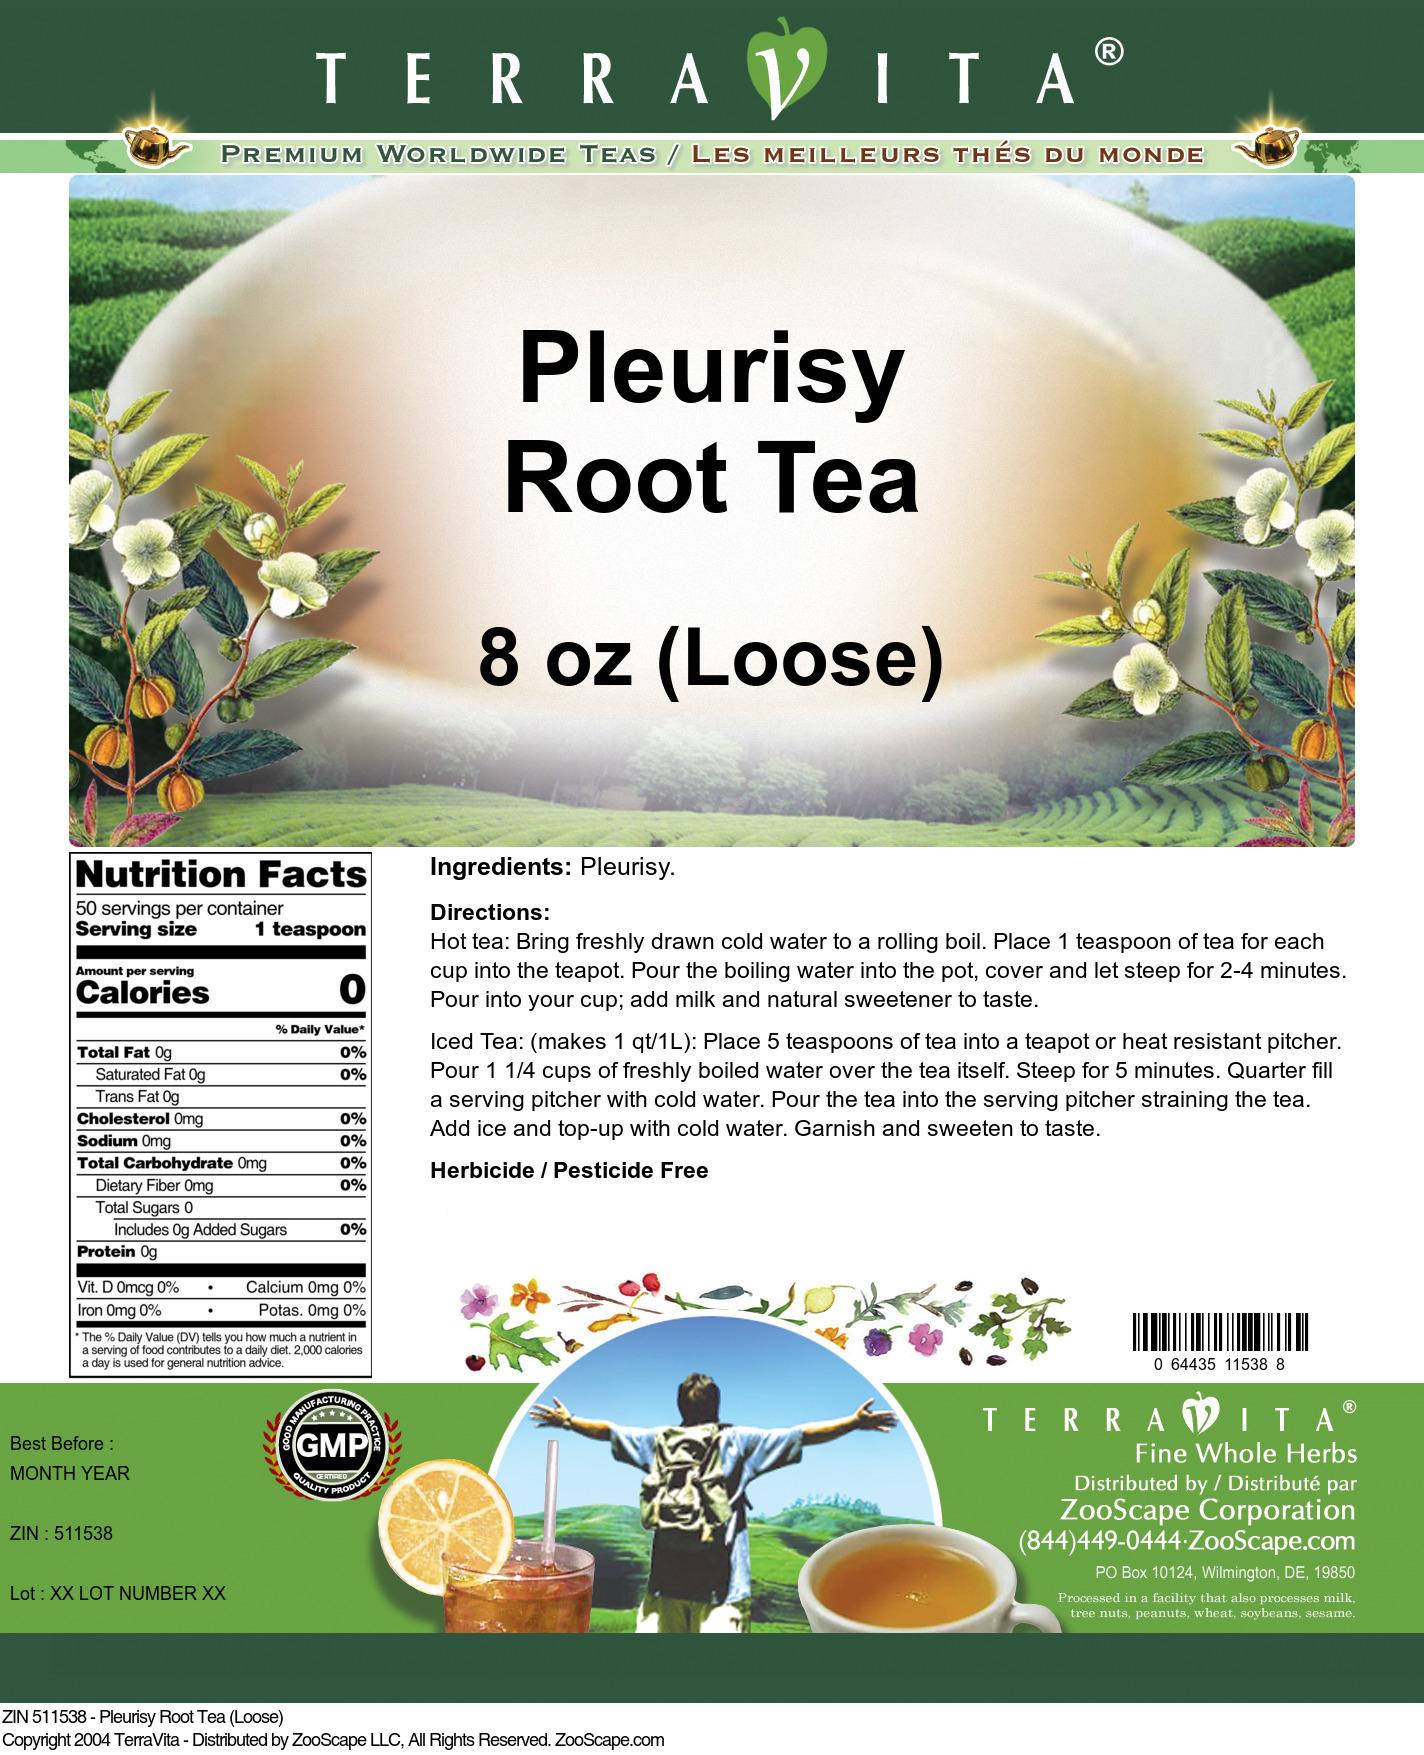 Pleurisy Root